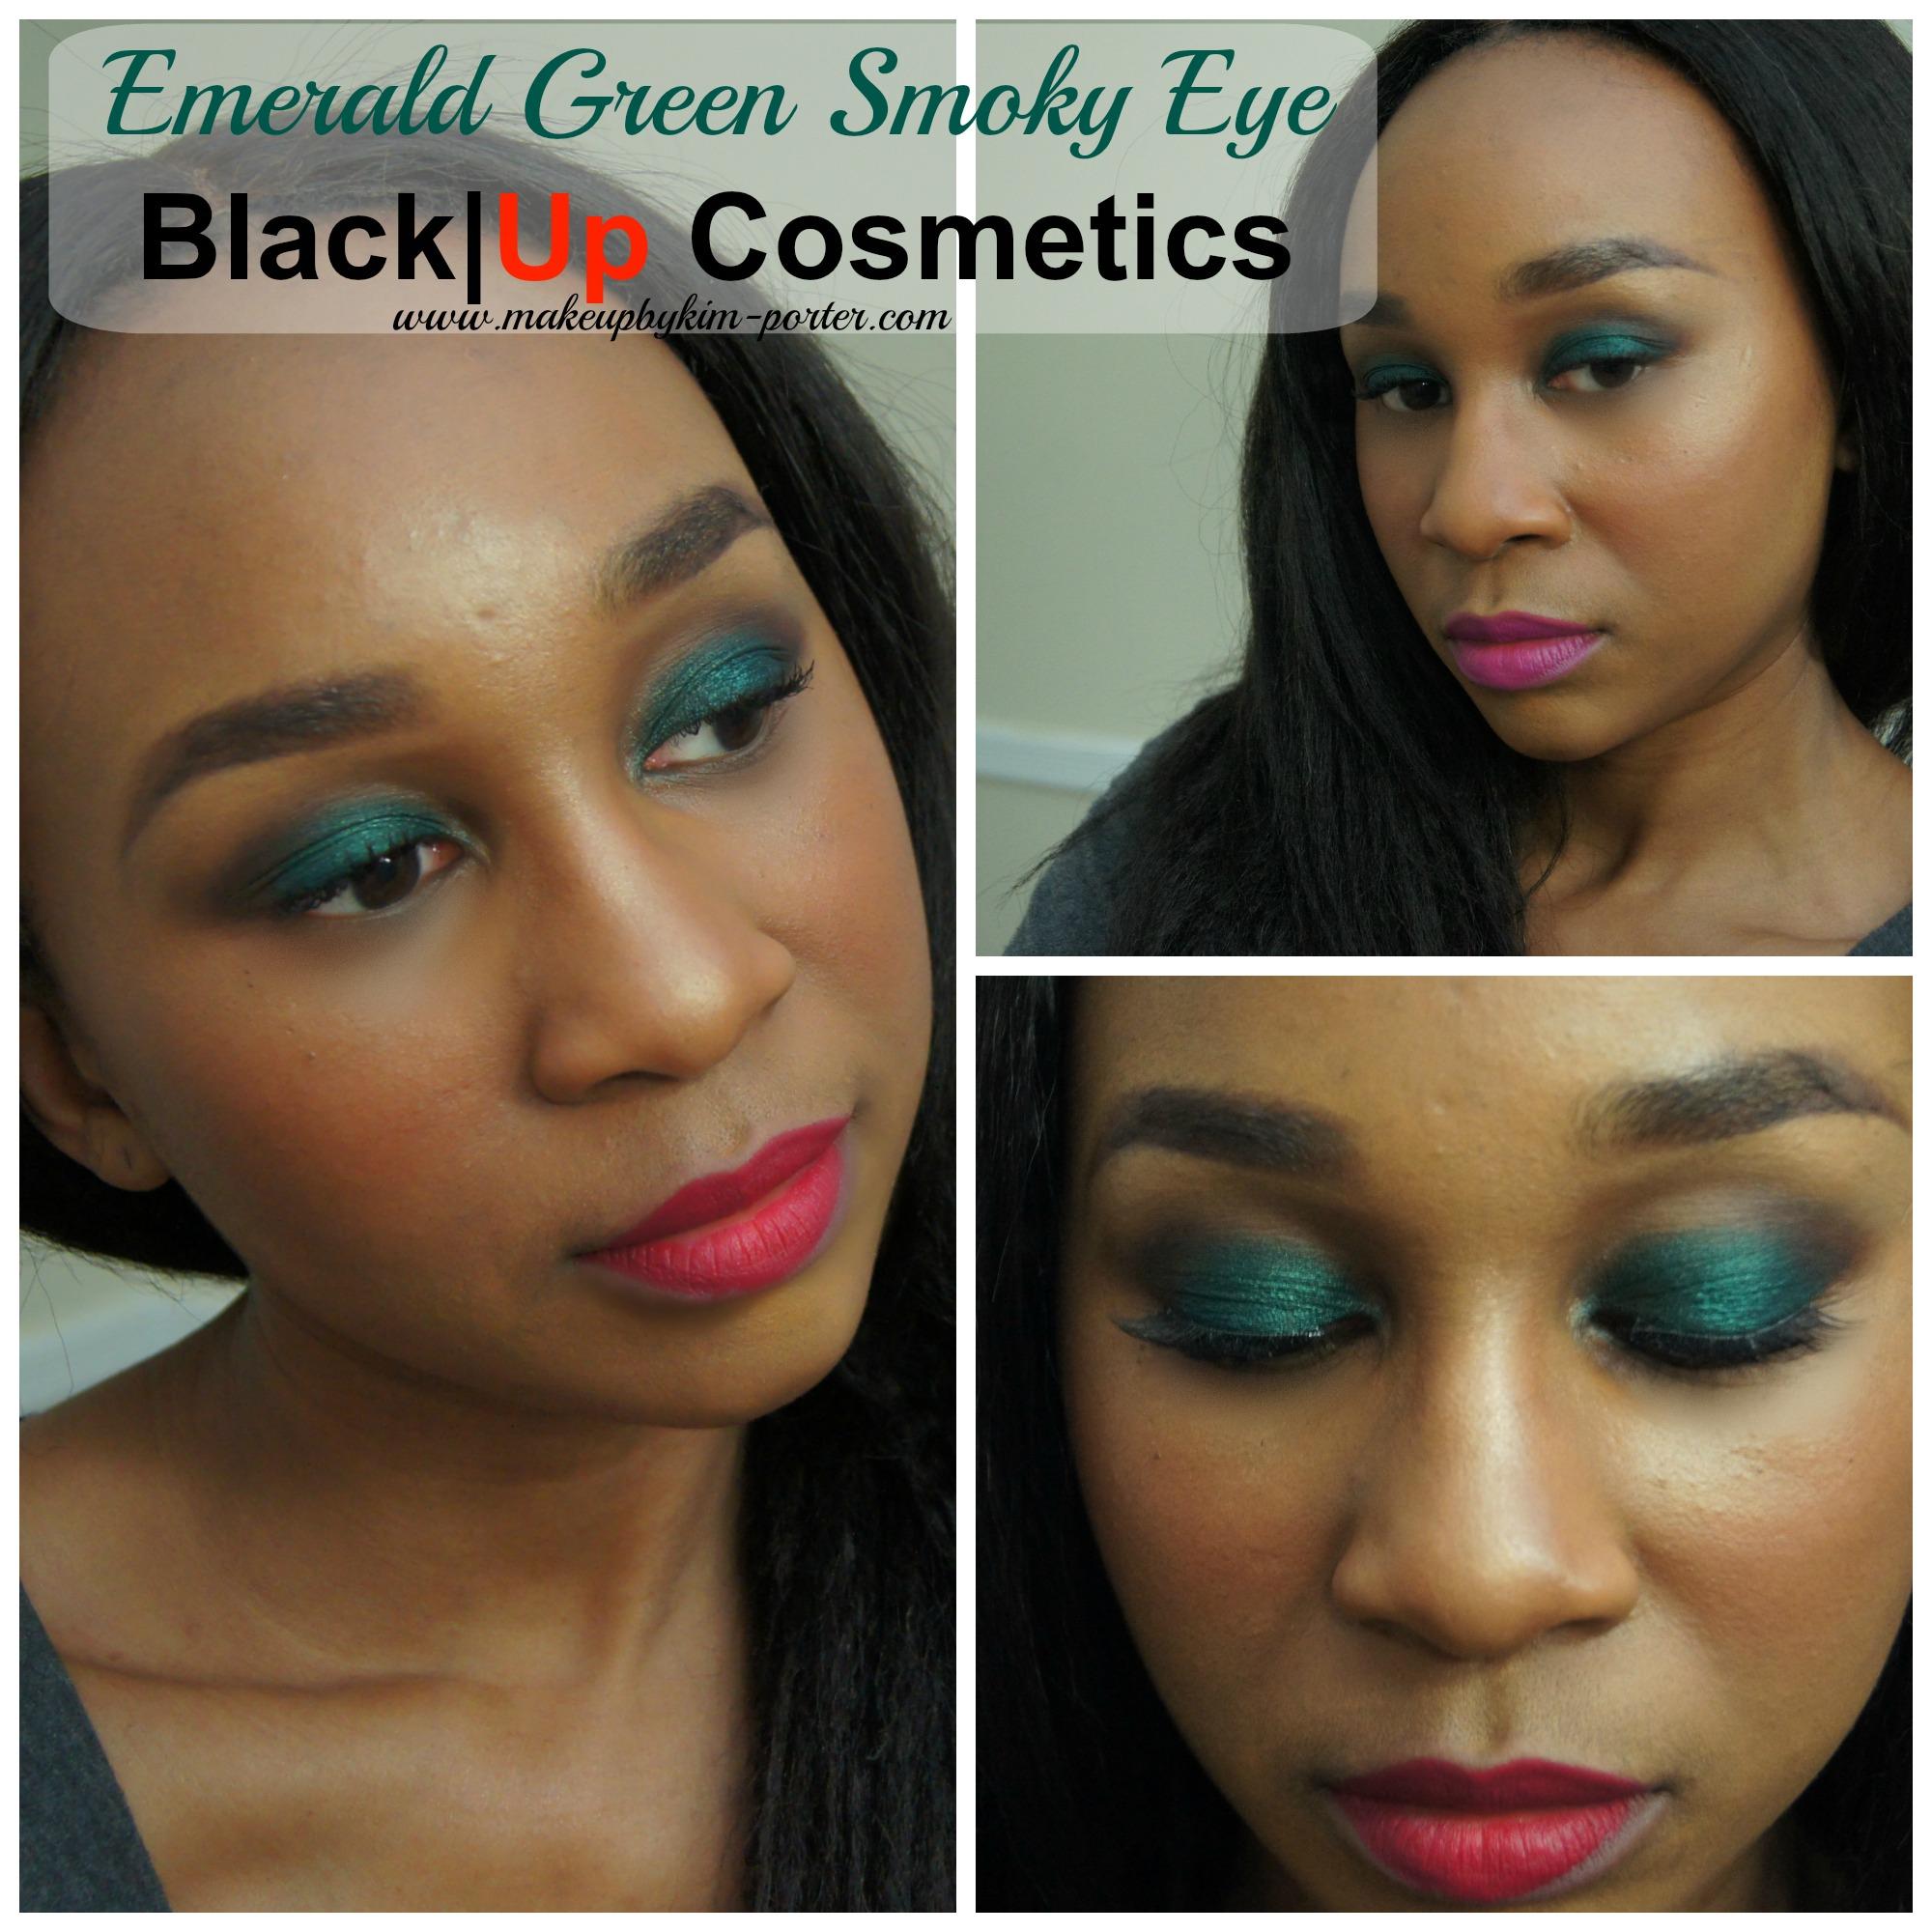 Emerald Green Smoky Eye Using Black Up Cosmetics